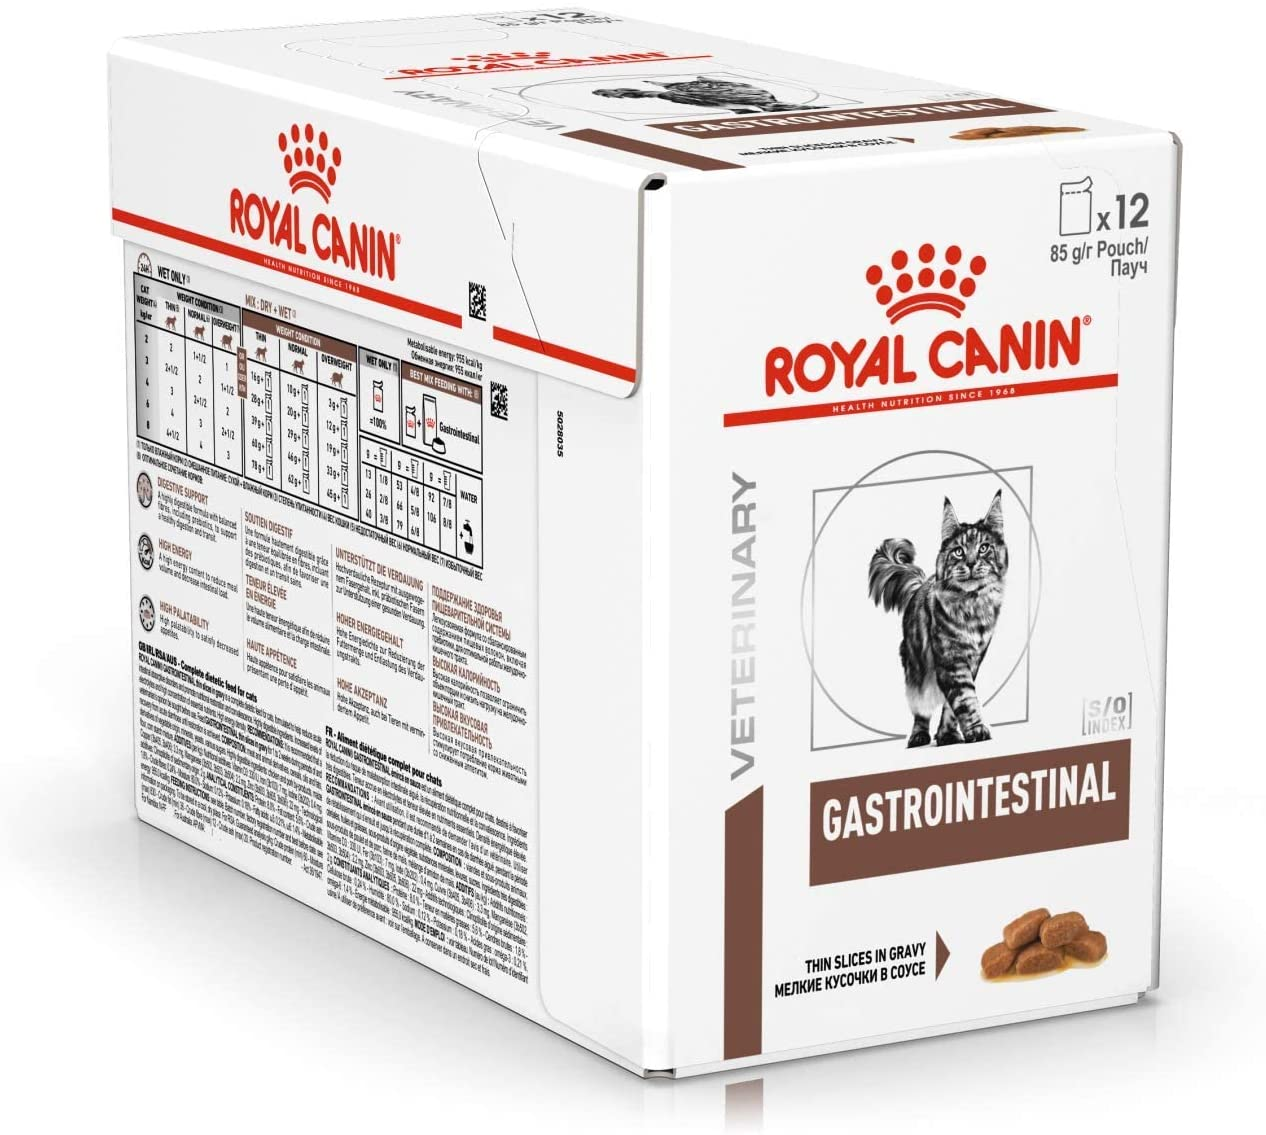 Gastro-Intestinal Feline Wet 100g x 12vnt.